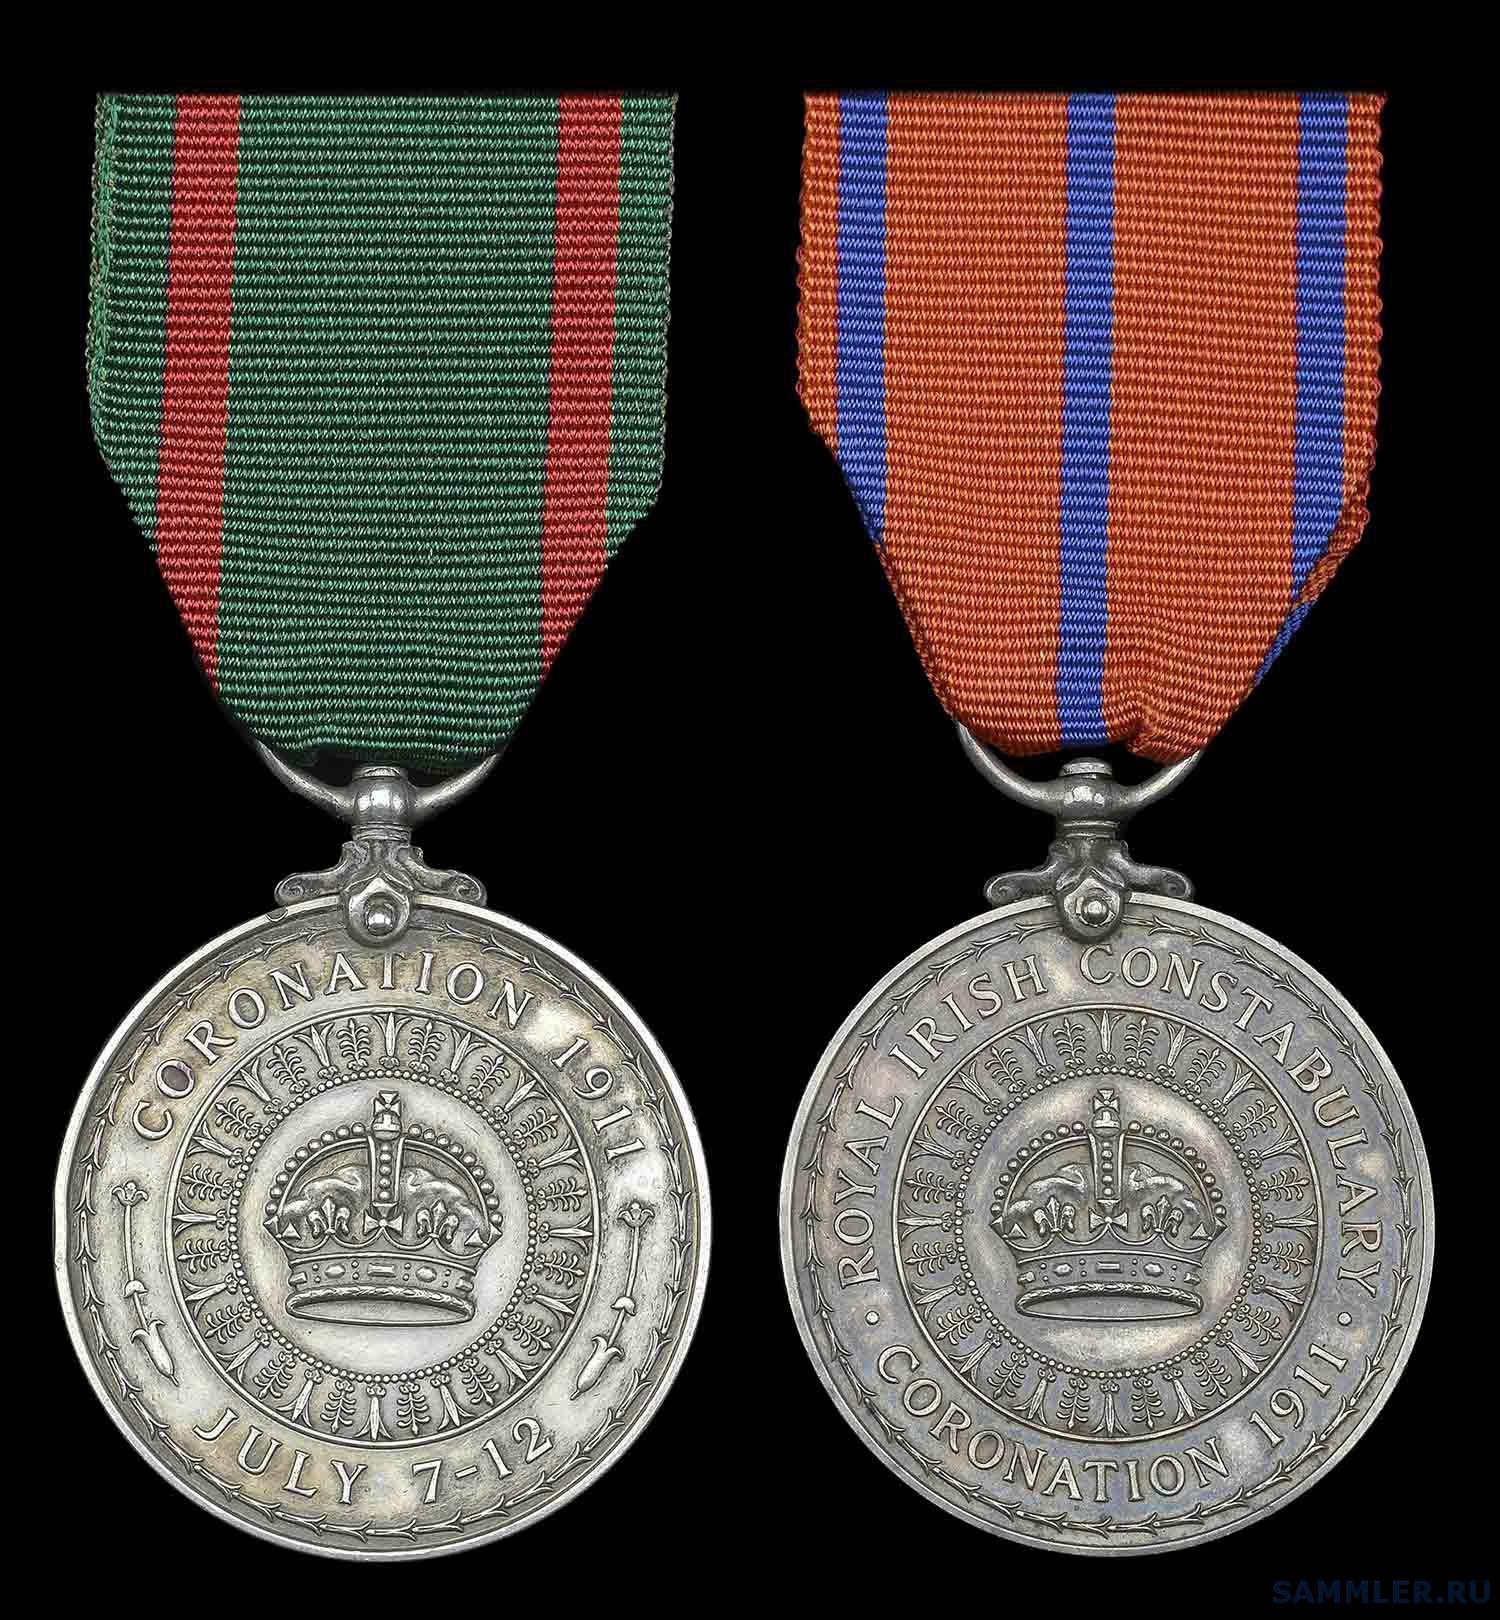 Coronation 1911, Royal Irish Constabulary; Visit to Ireland 1911 а.jpg